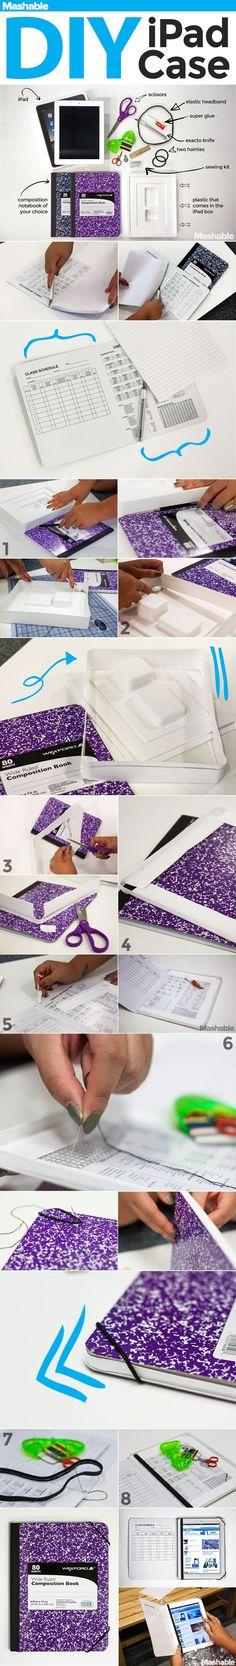 DIY Ipad Case diy craft crafts craft ideas easy crafts diy ideas diy crafts easy diy